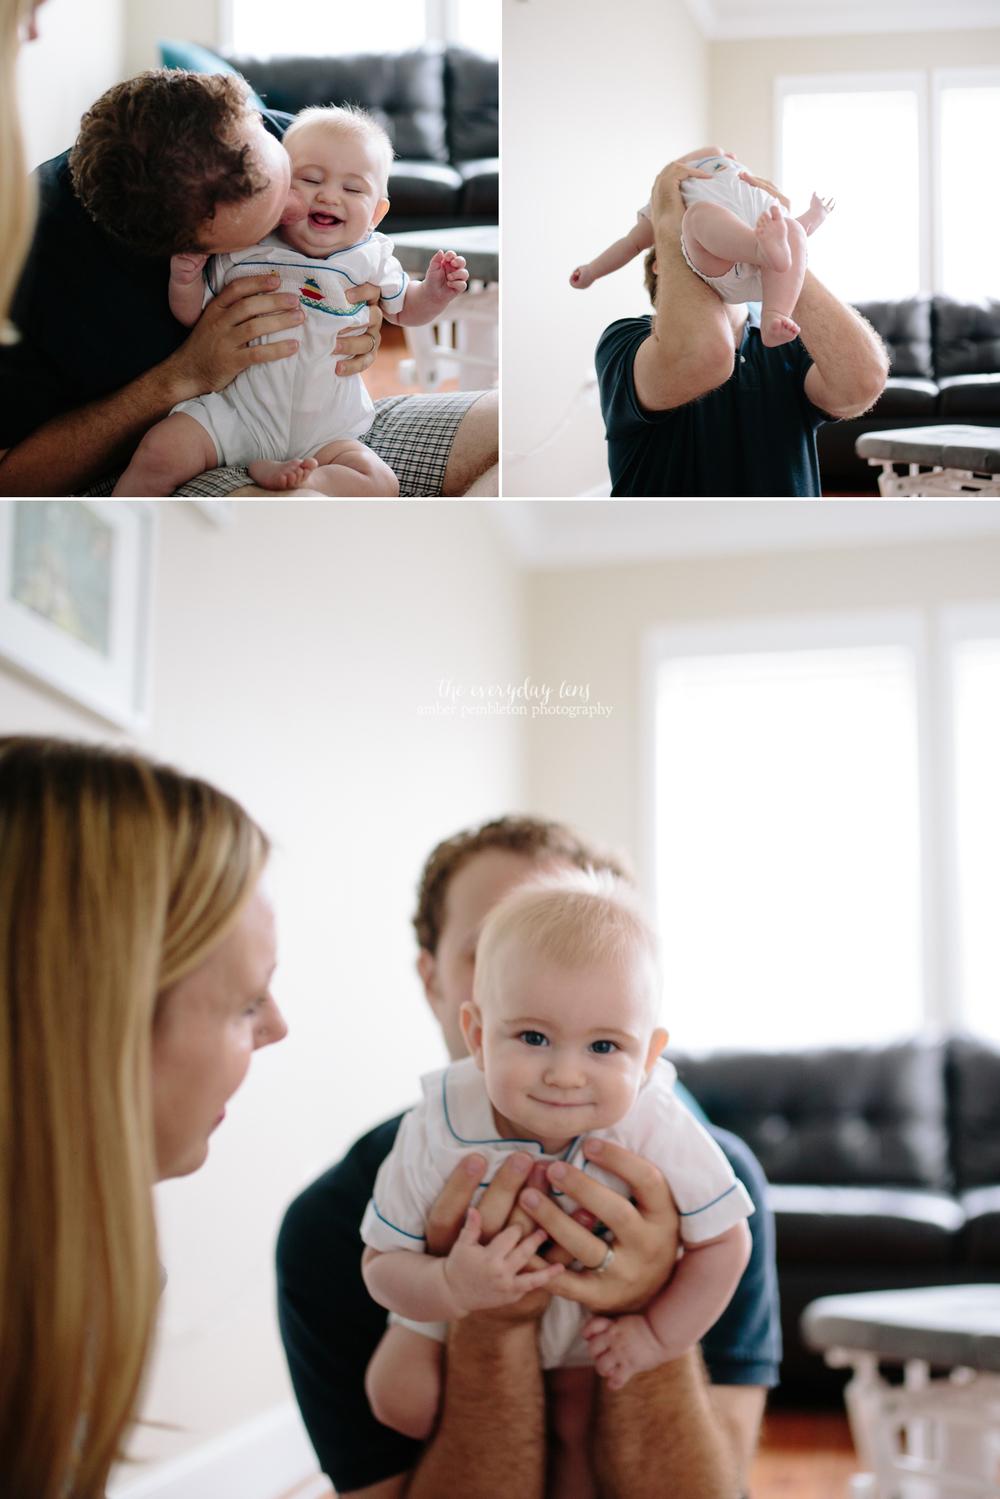 giggling-baby.jpg